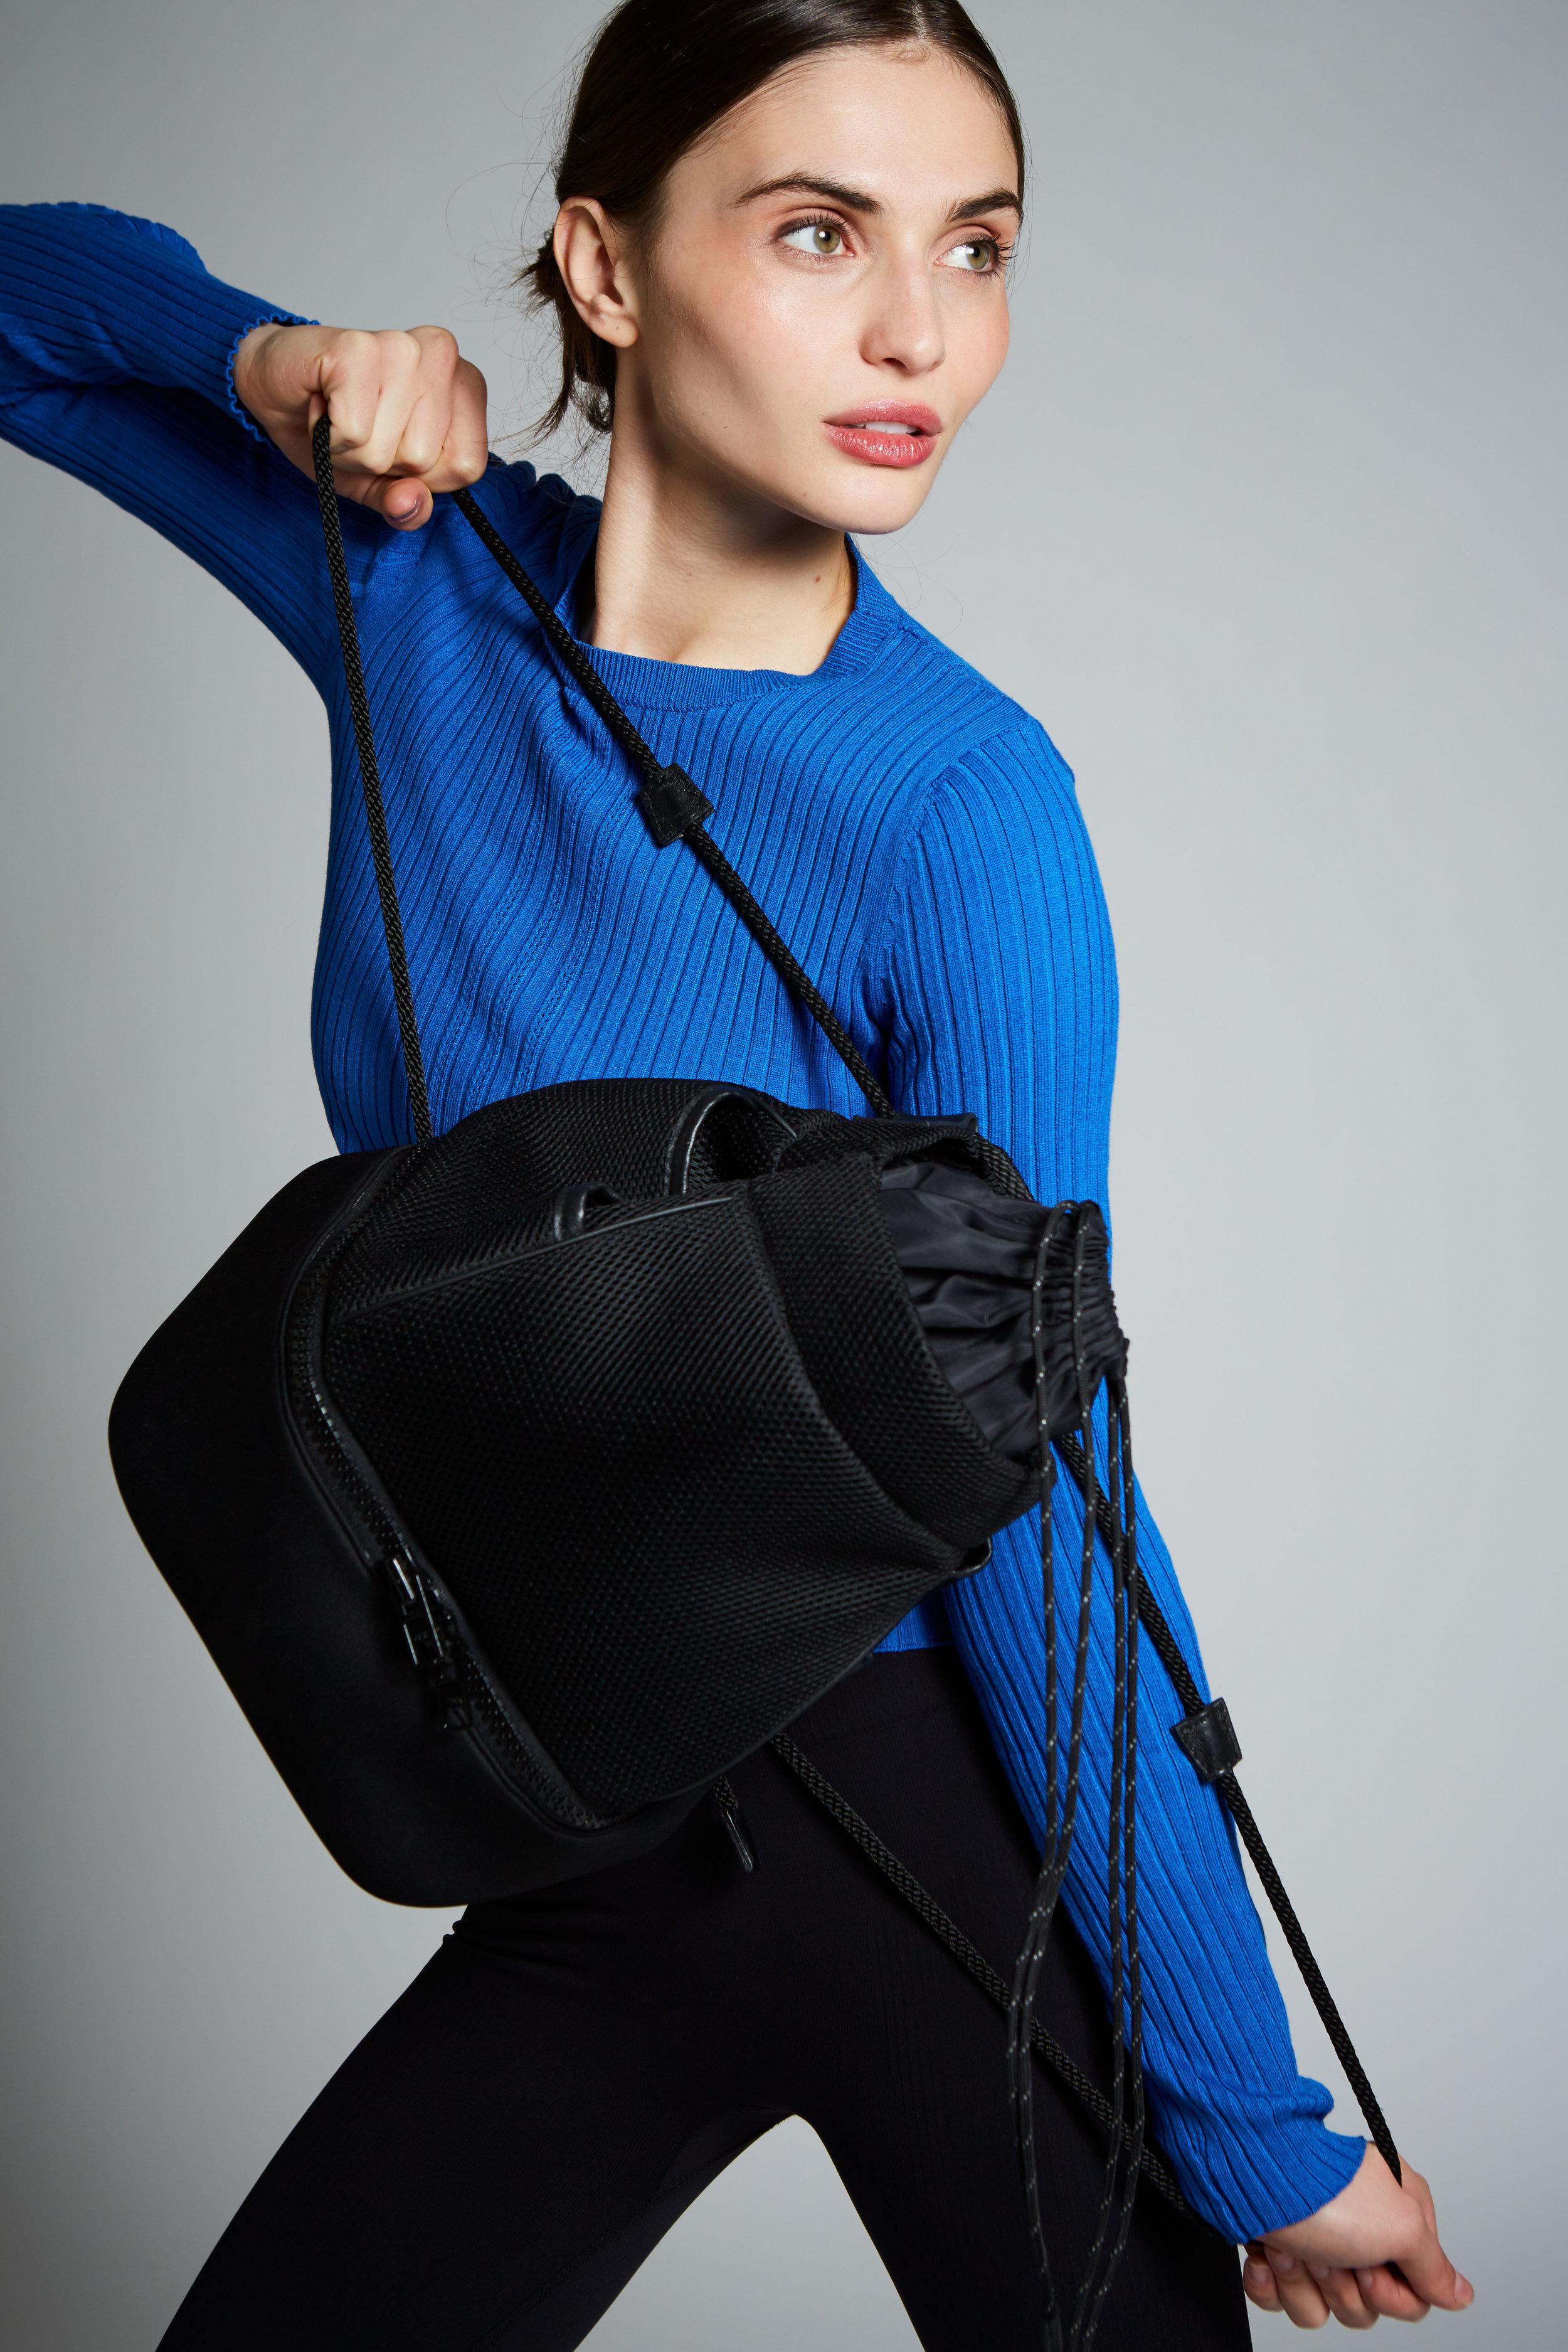 black-backpack.jpg